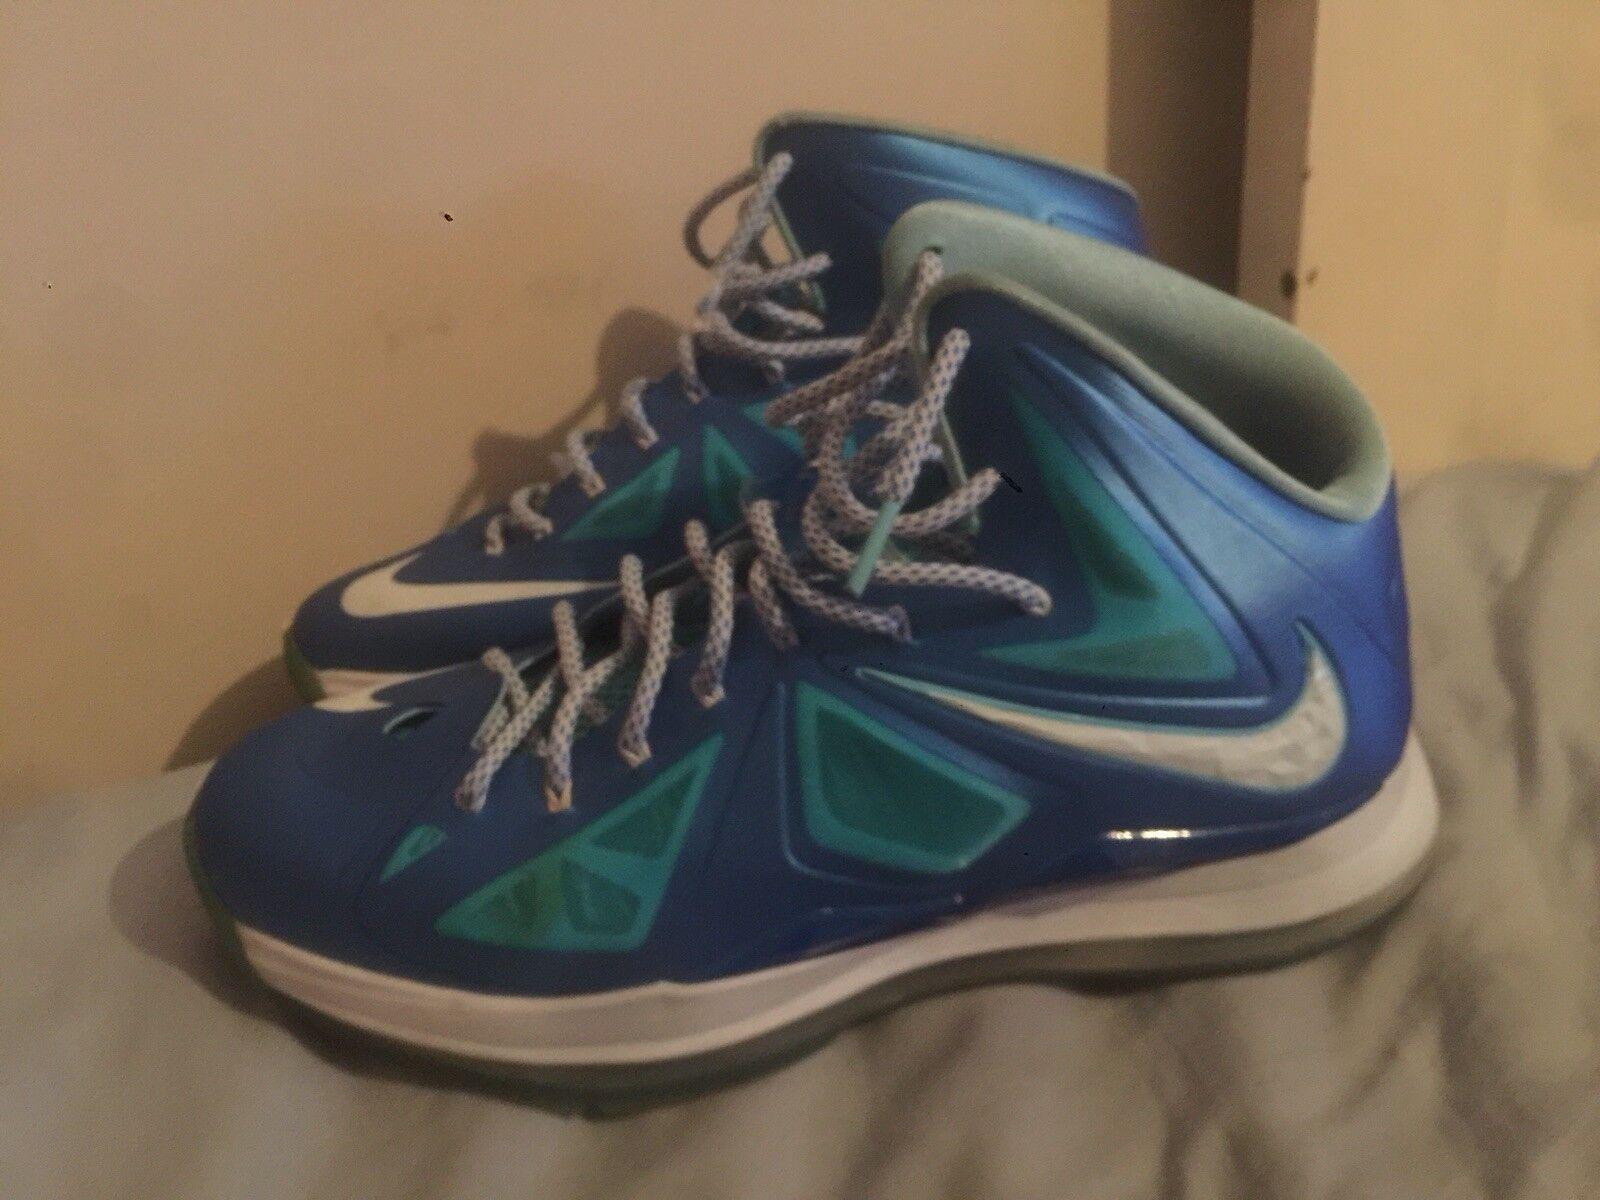 52e6842333e7 Nike Lebron X 10 Blue Diamond size 11 11 11 a6e505 - buckle ...